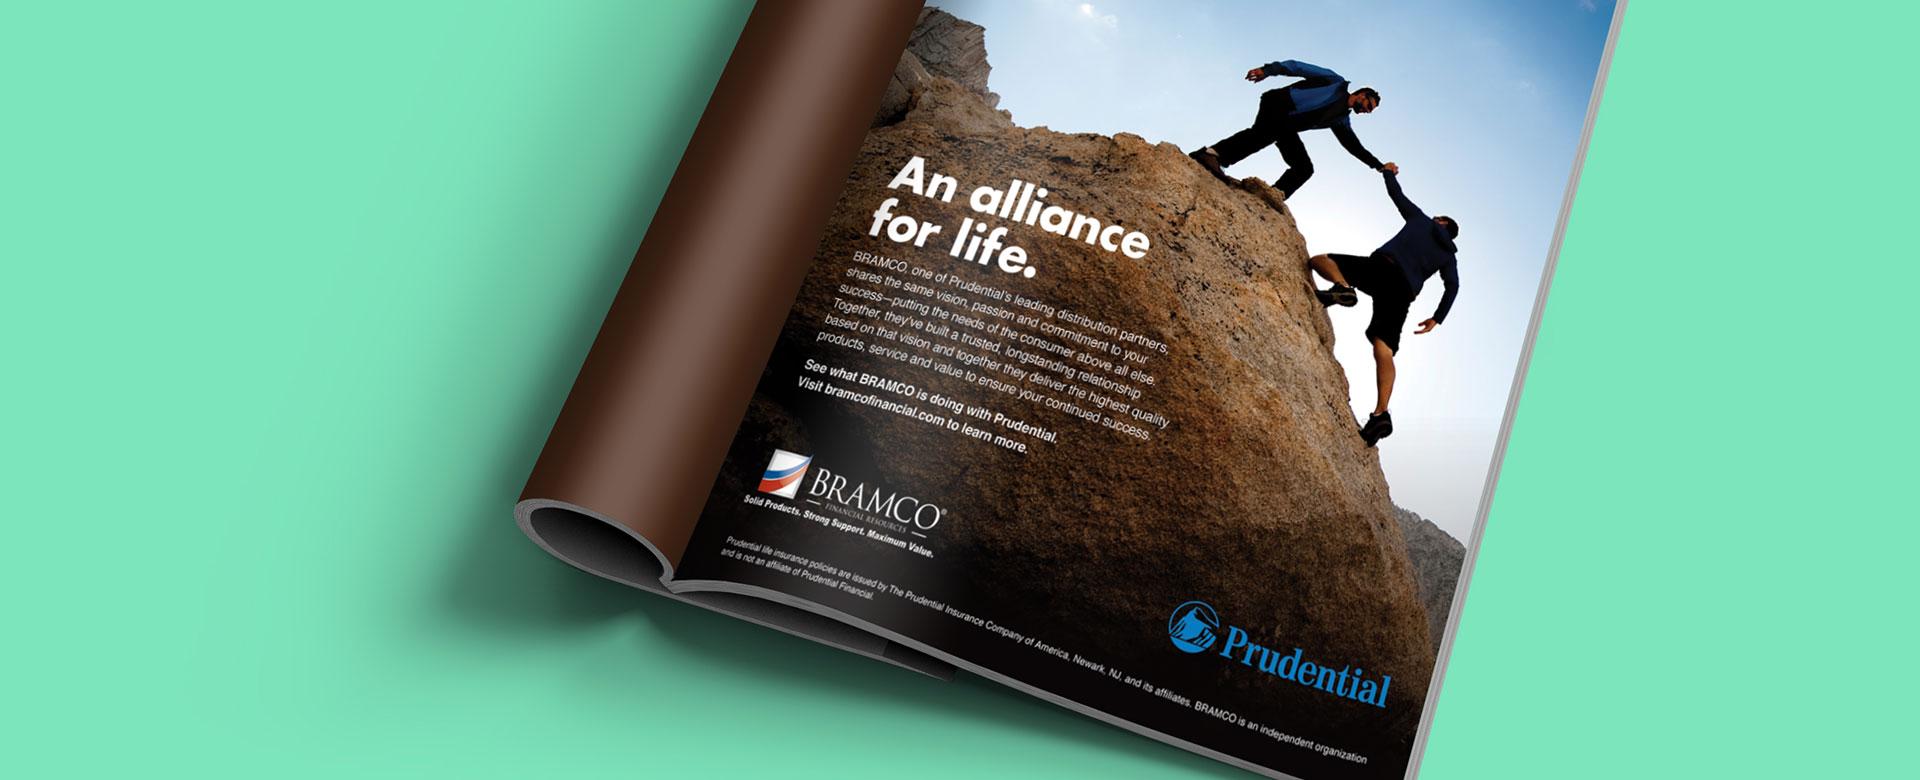 Bramco Prudential Co Miami Branded Magazine Print Ad